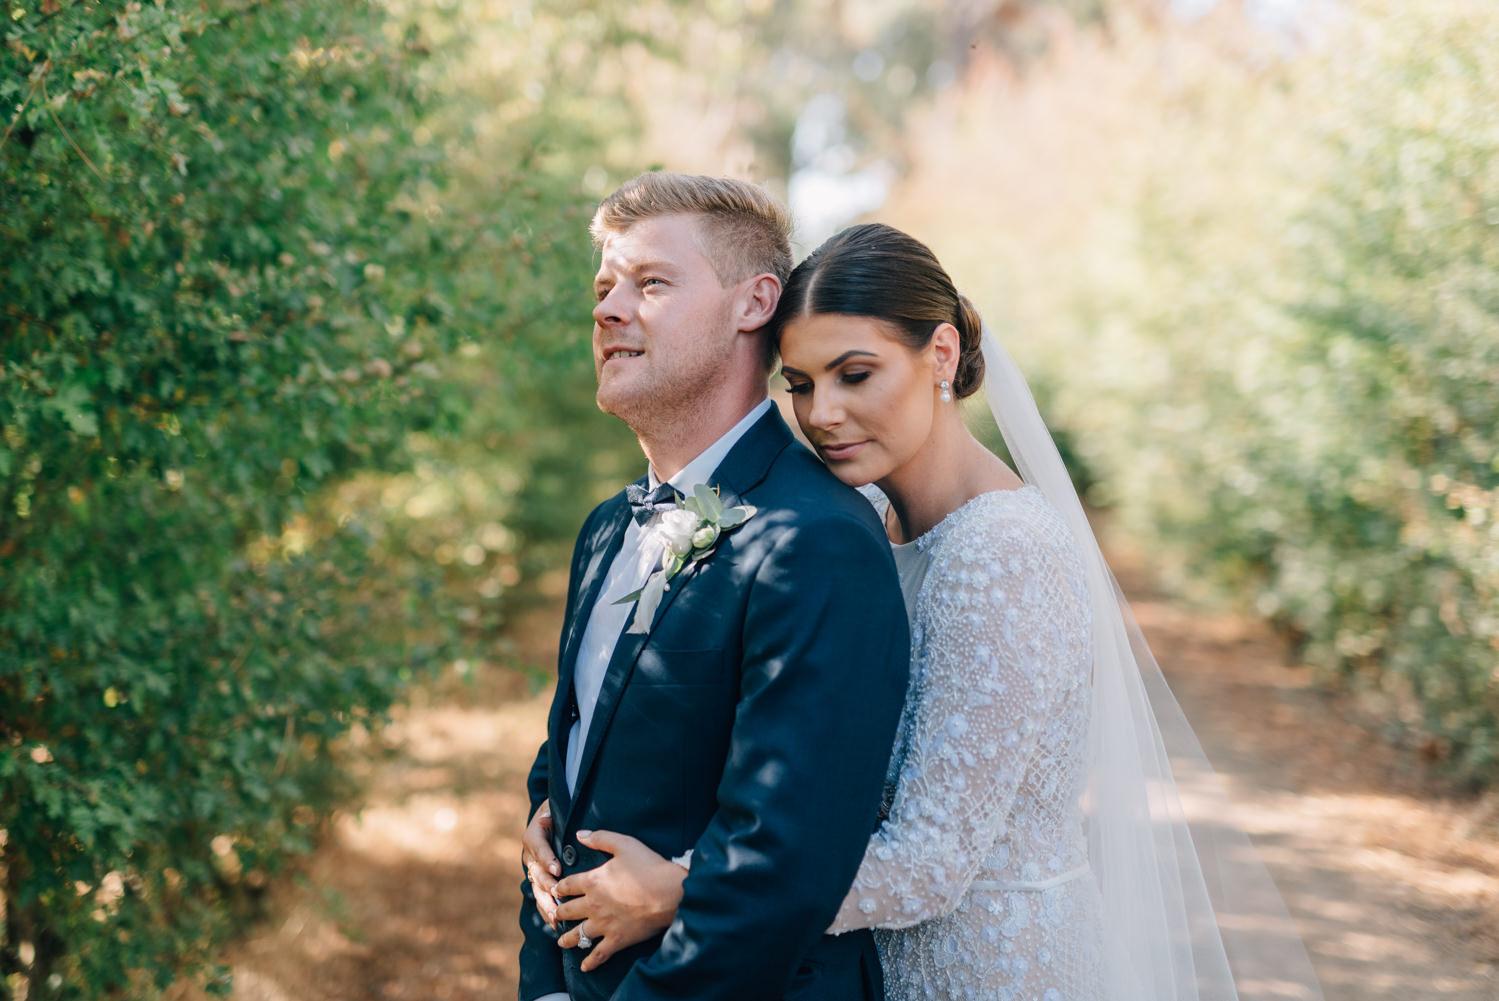 Quamby-Wedding-Photography-91.jpg